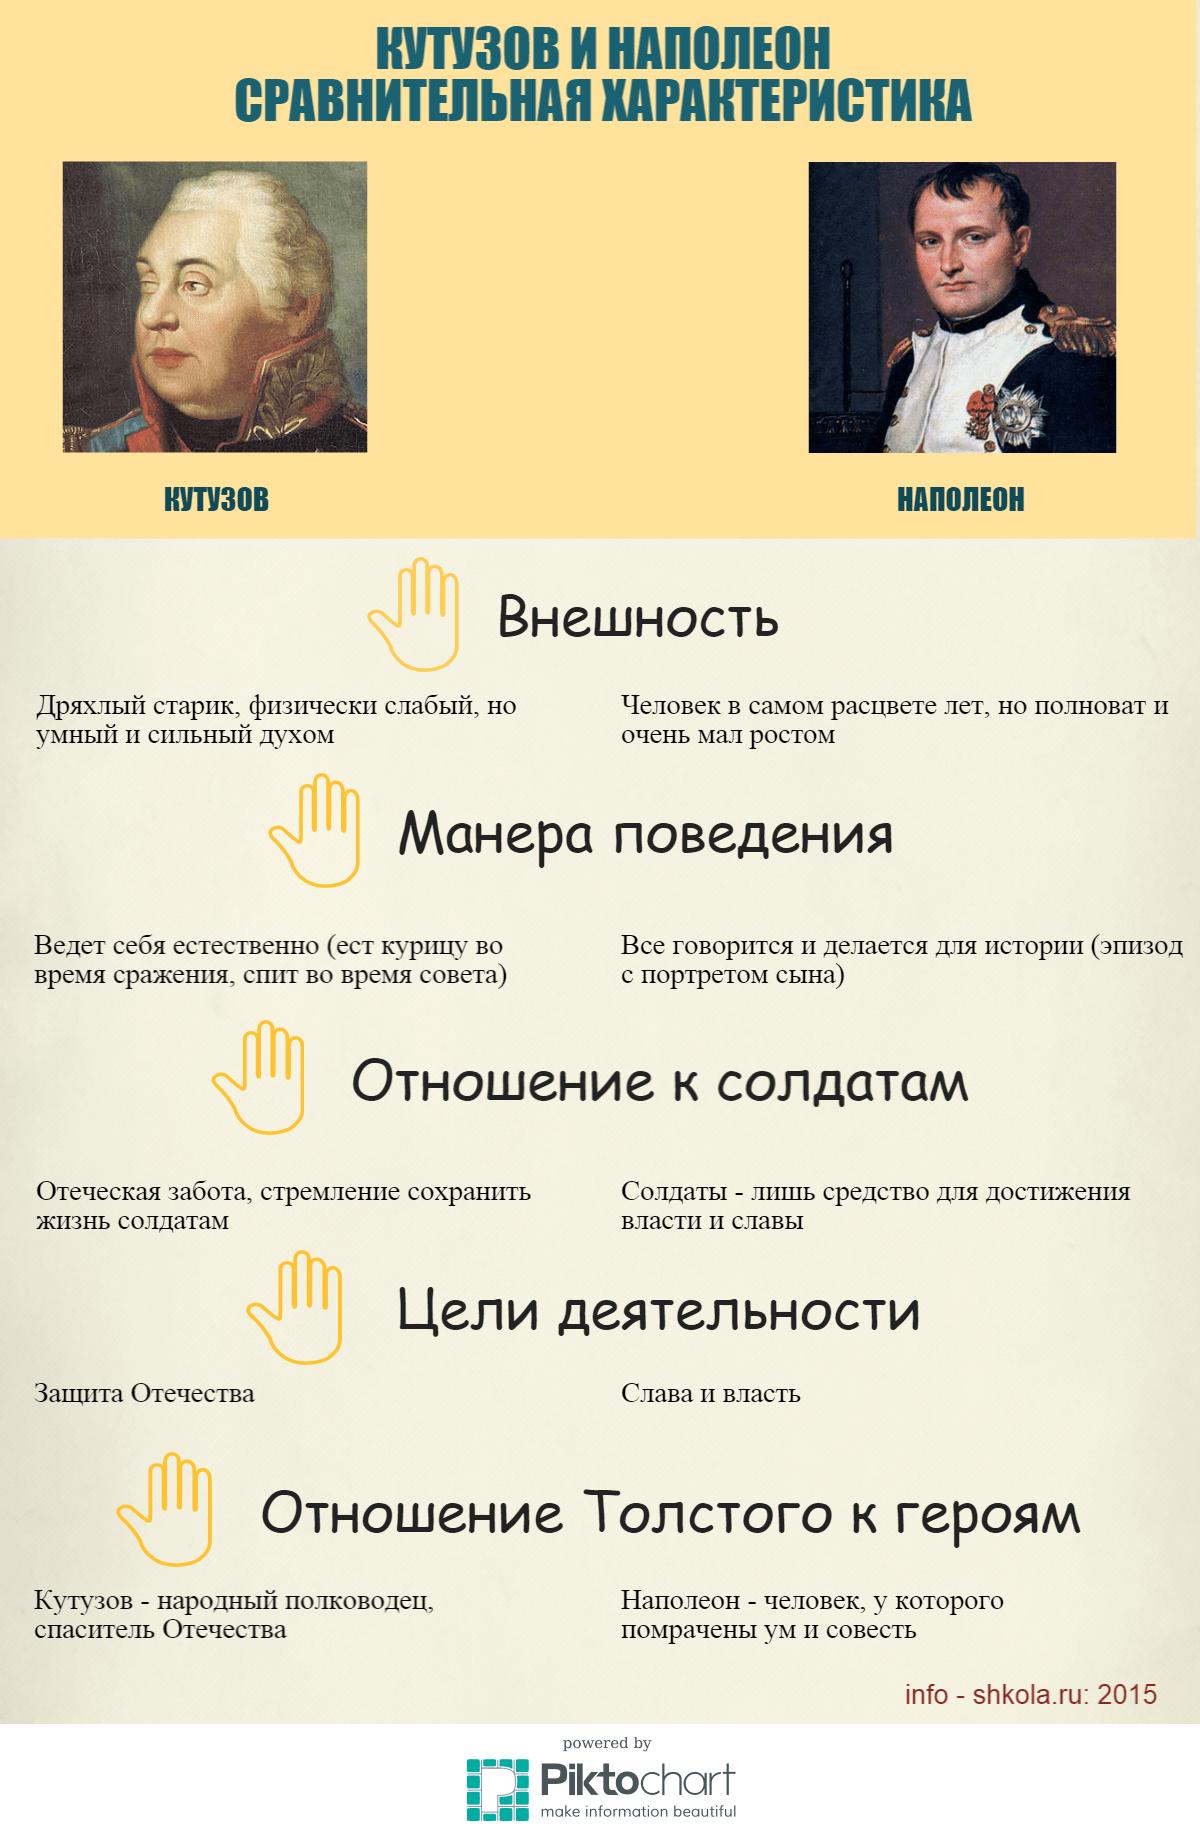 Кутузов и наполеон сравнение